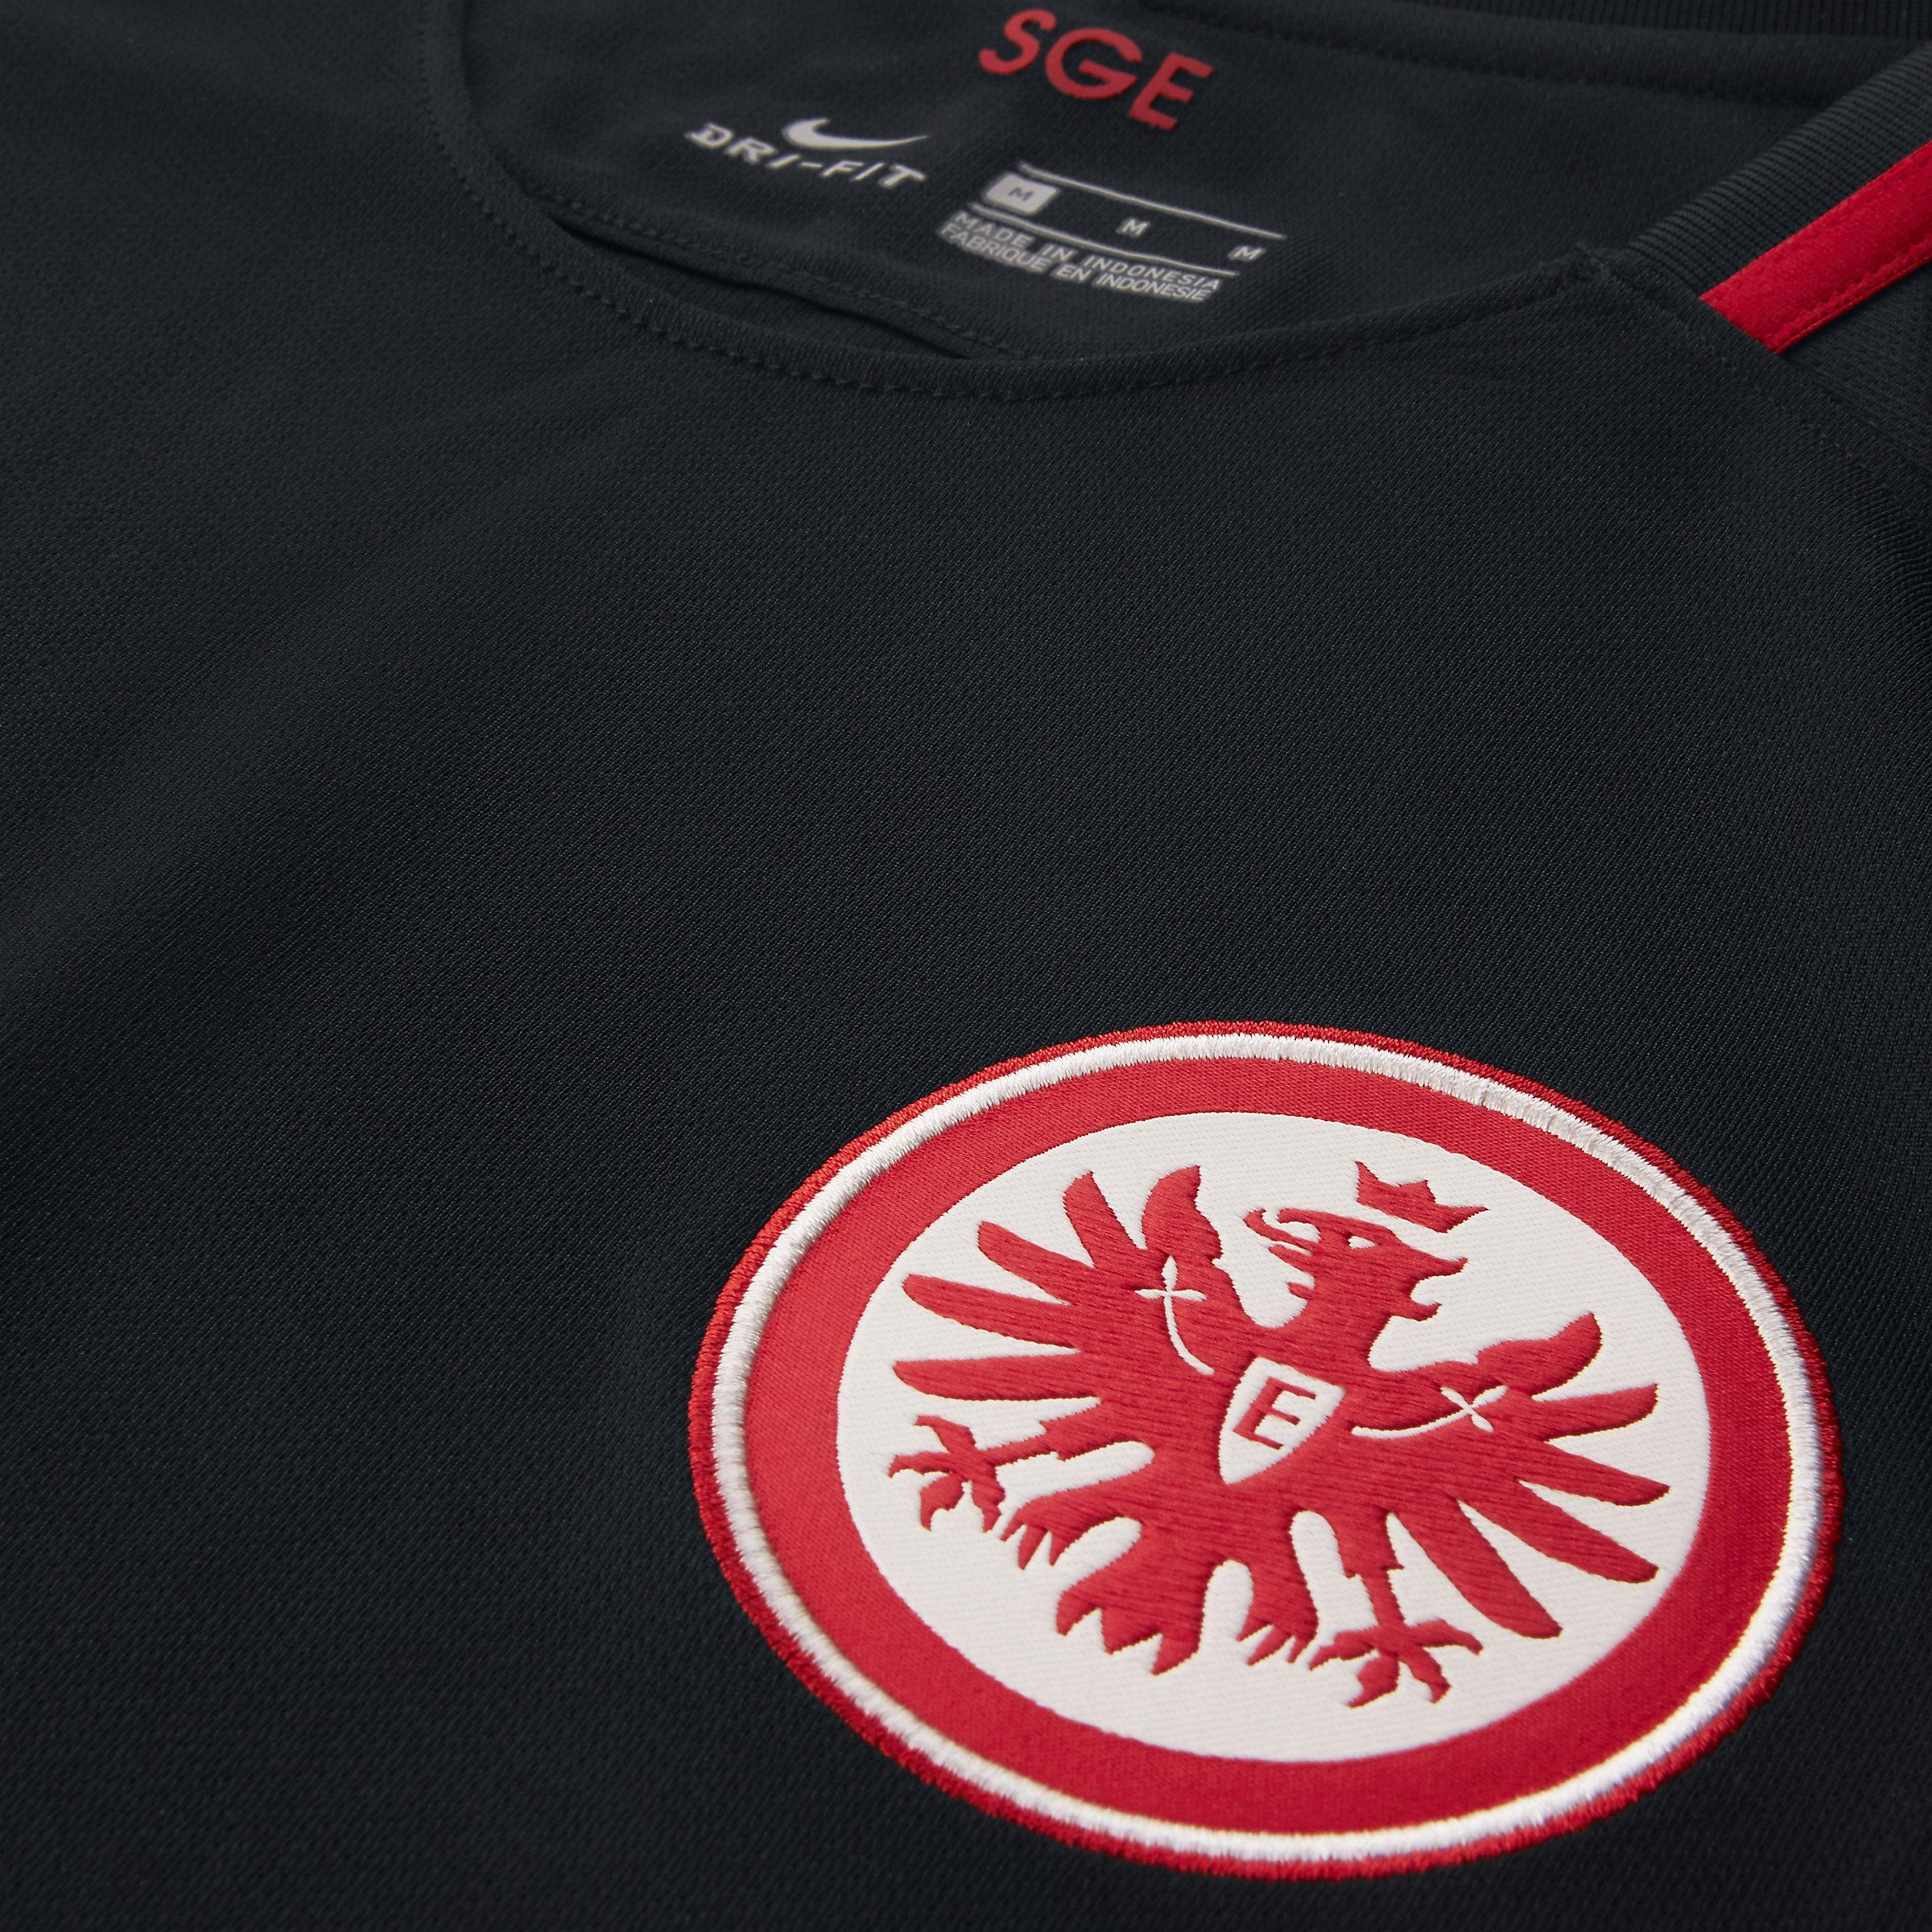 Nike Synthetic 2017/18 Eintracht Frankfurt Stadium Away in Black,University Red (Black) for Men